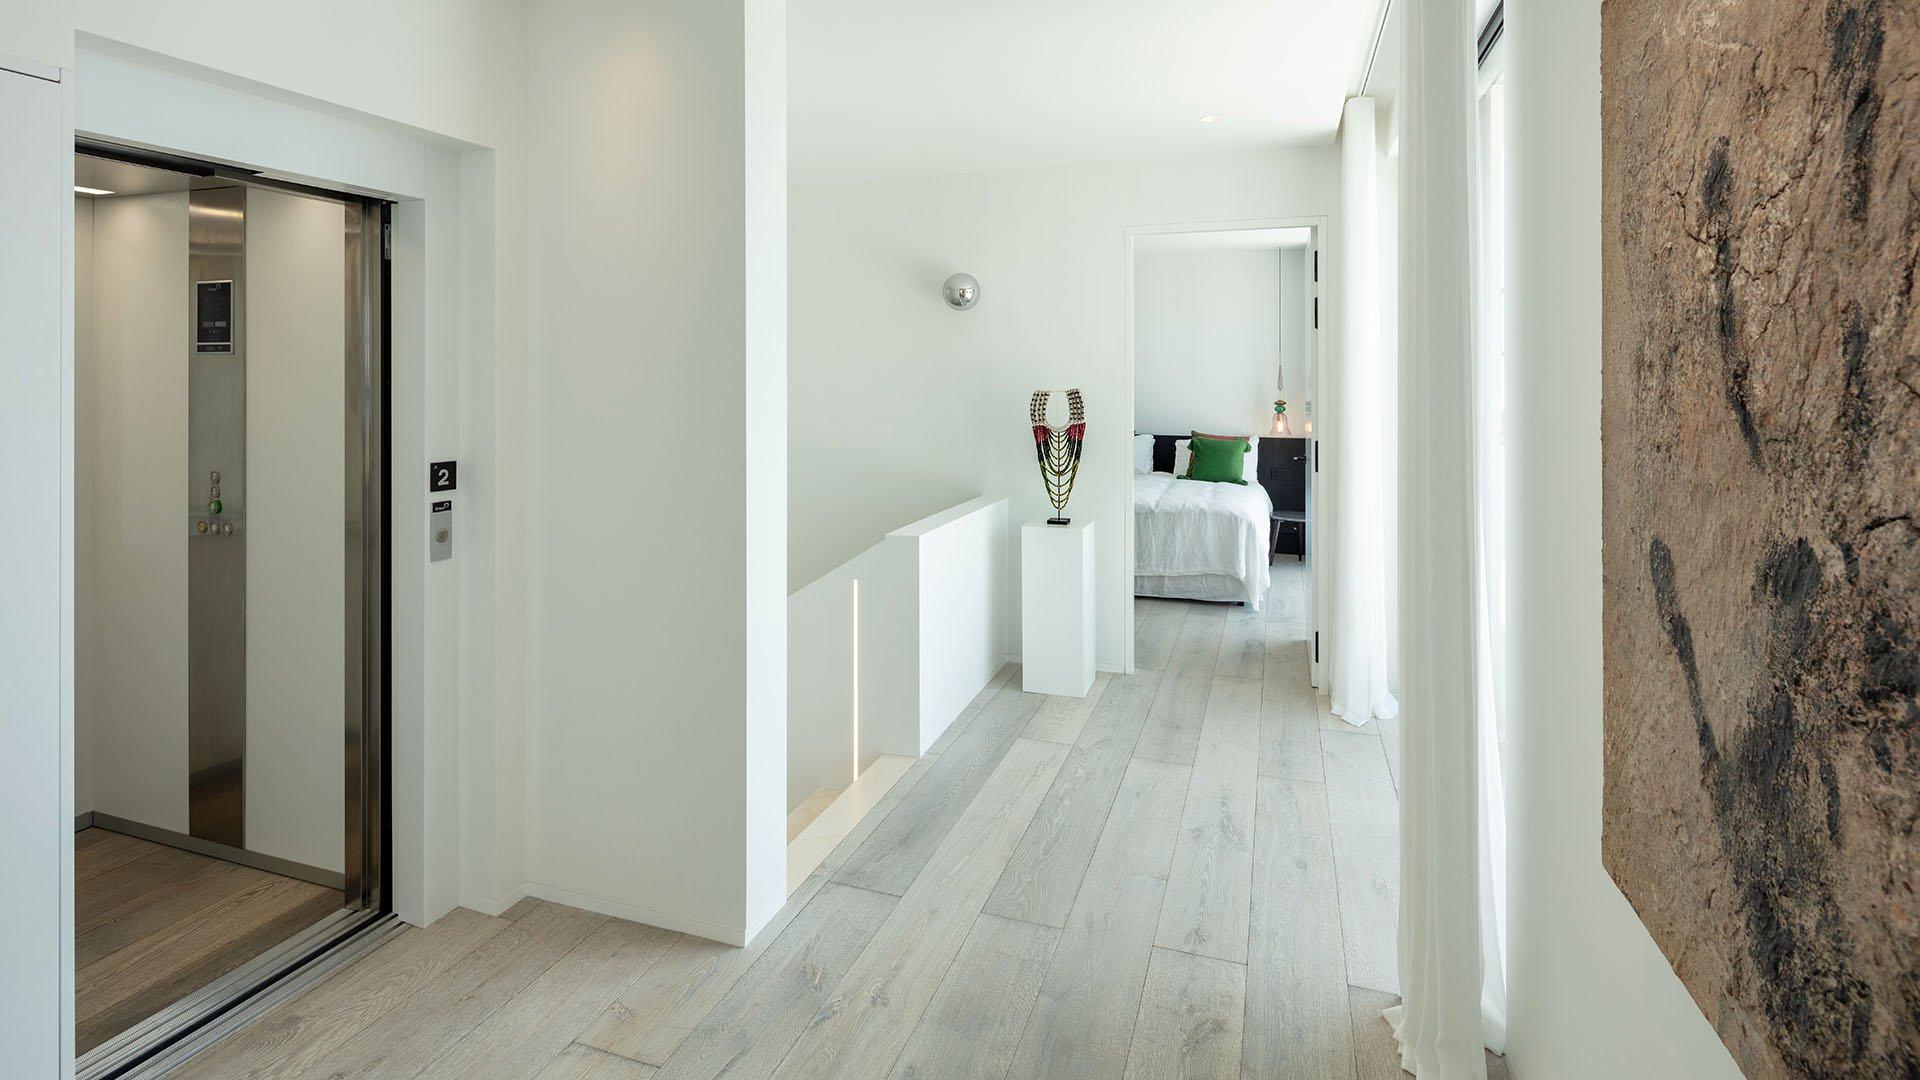 Camojan 45: Impressive newly built villa at the foot of Sierra Blanca in Marbella